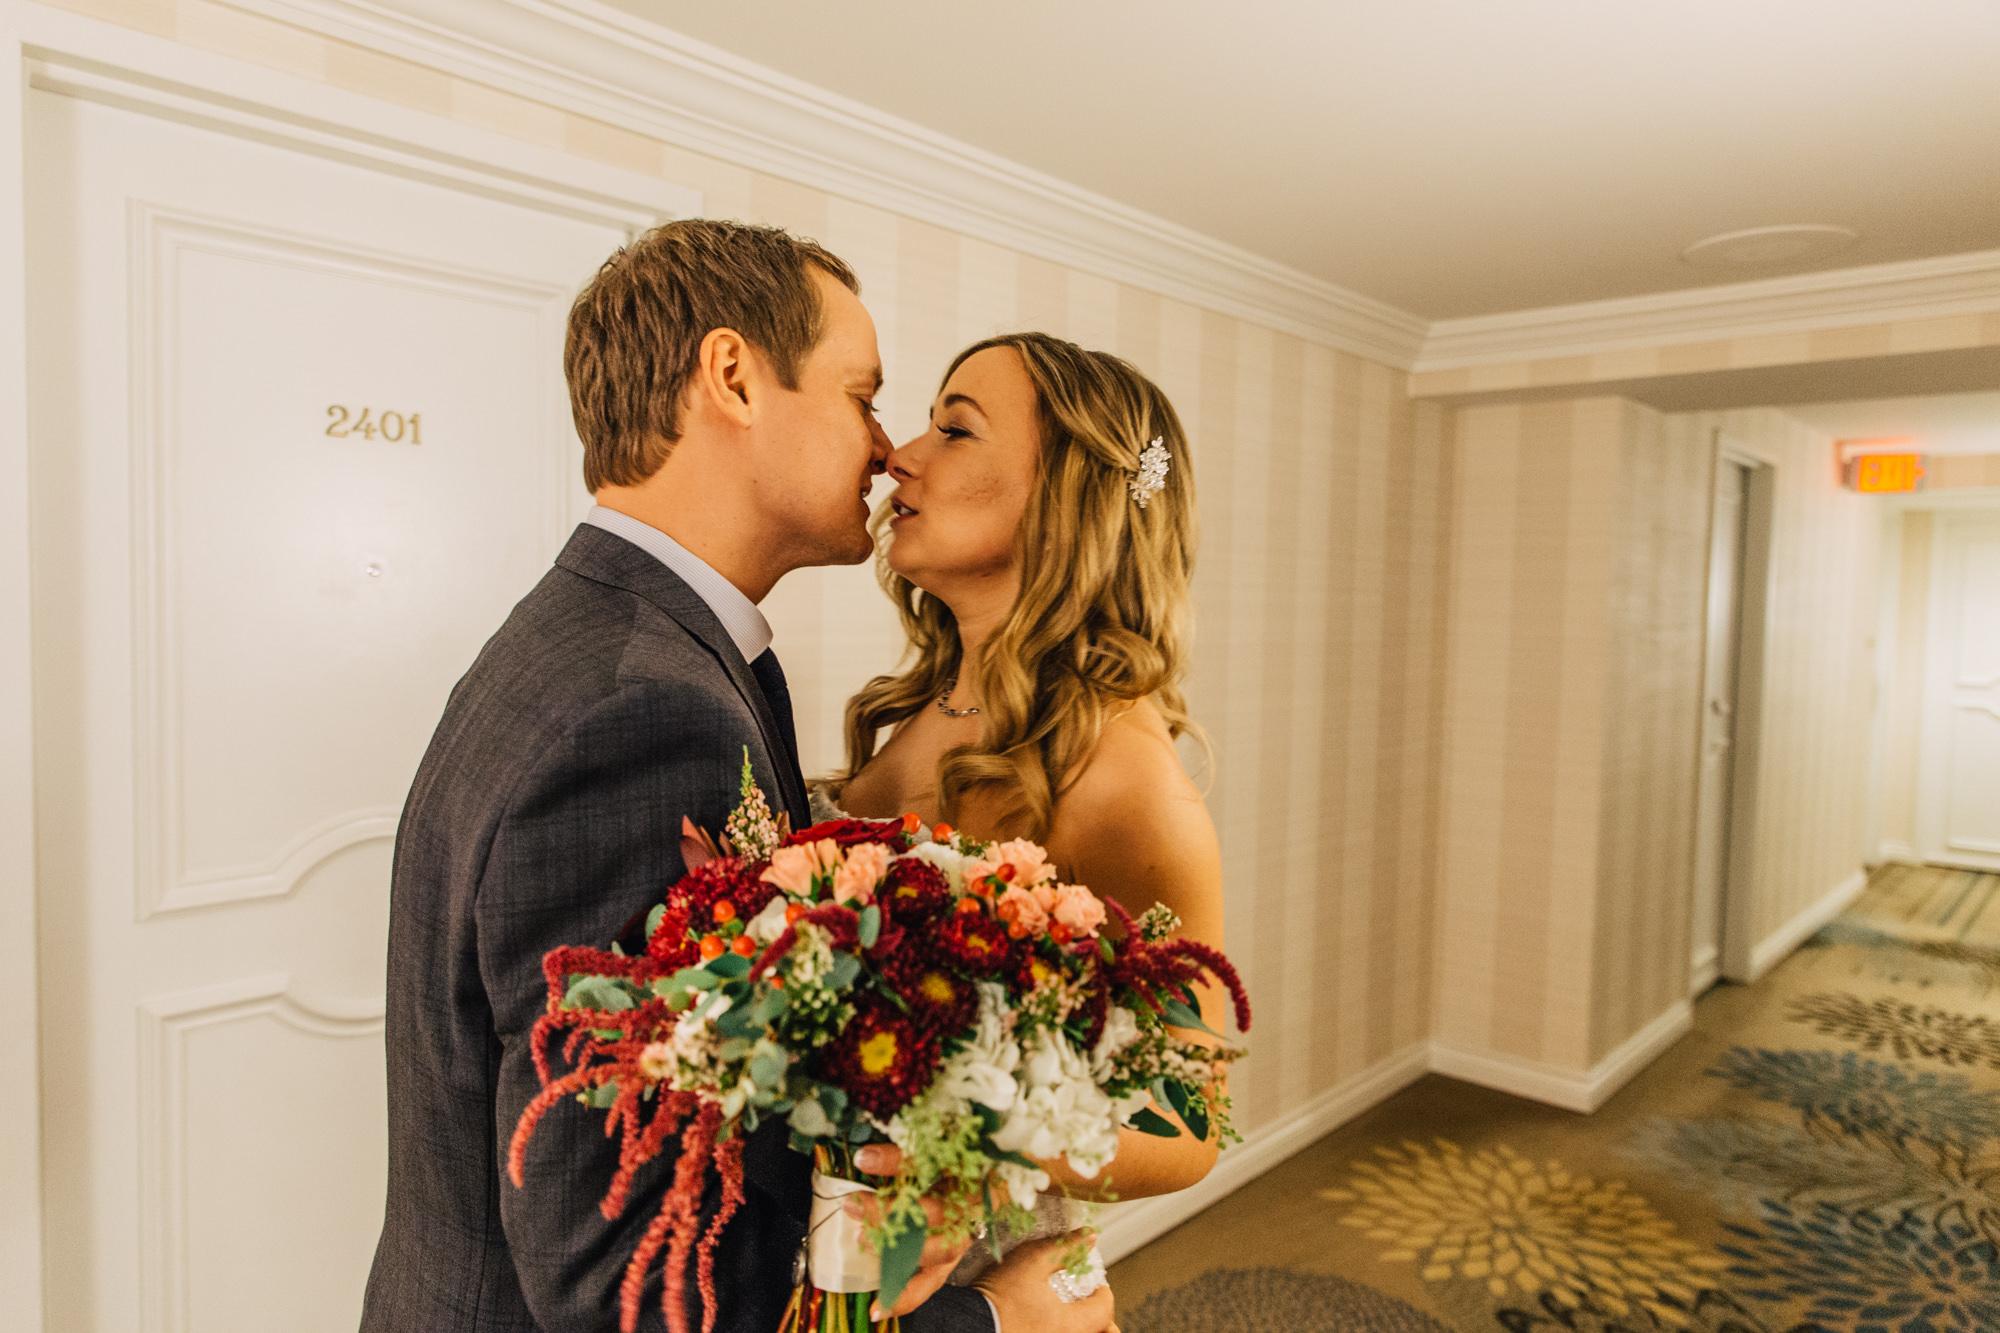 11-four-seasons-hotel-hallway-first-kiss.jpg